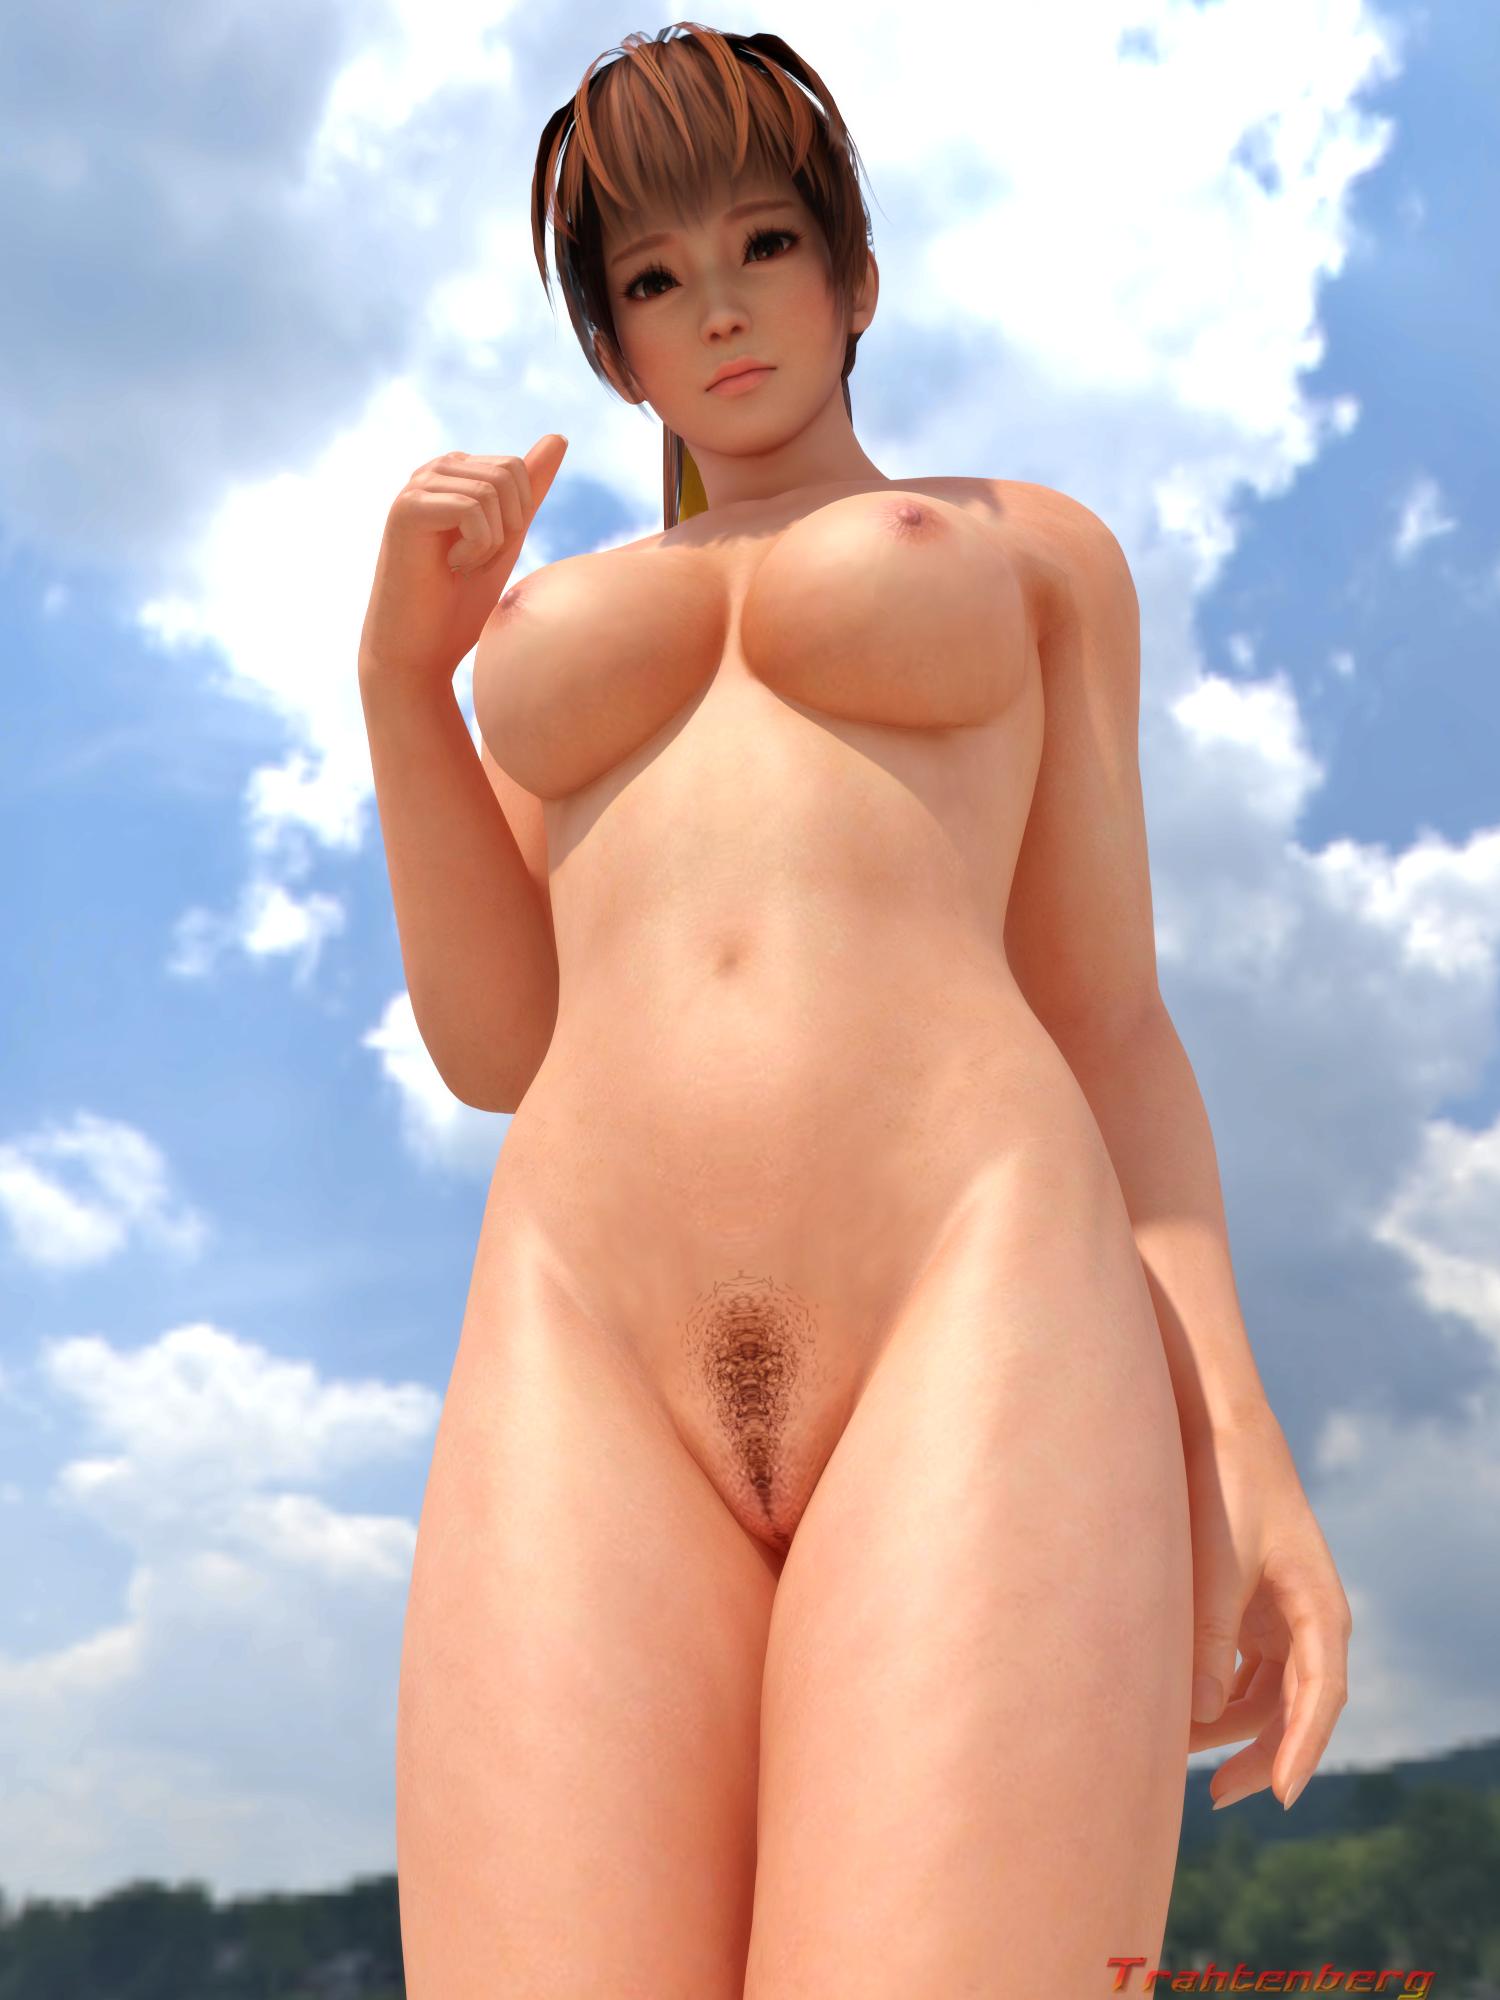 doa5 nude kasumi Sexy Kasumi 2 (Nude ver.) by Trahtenberg.deviantart.com on @